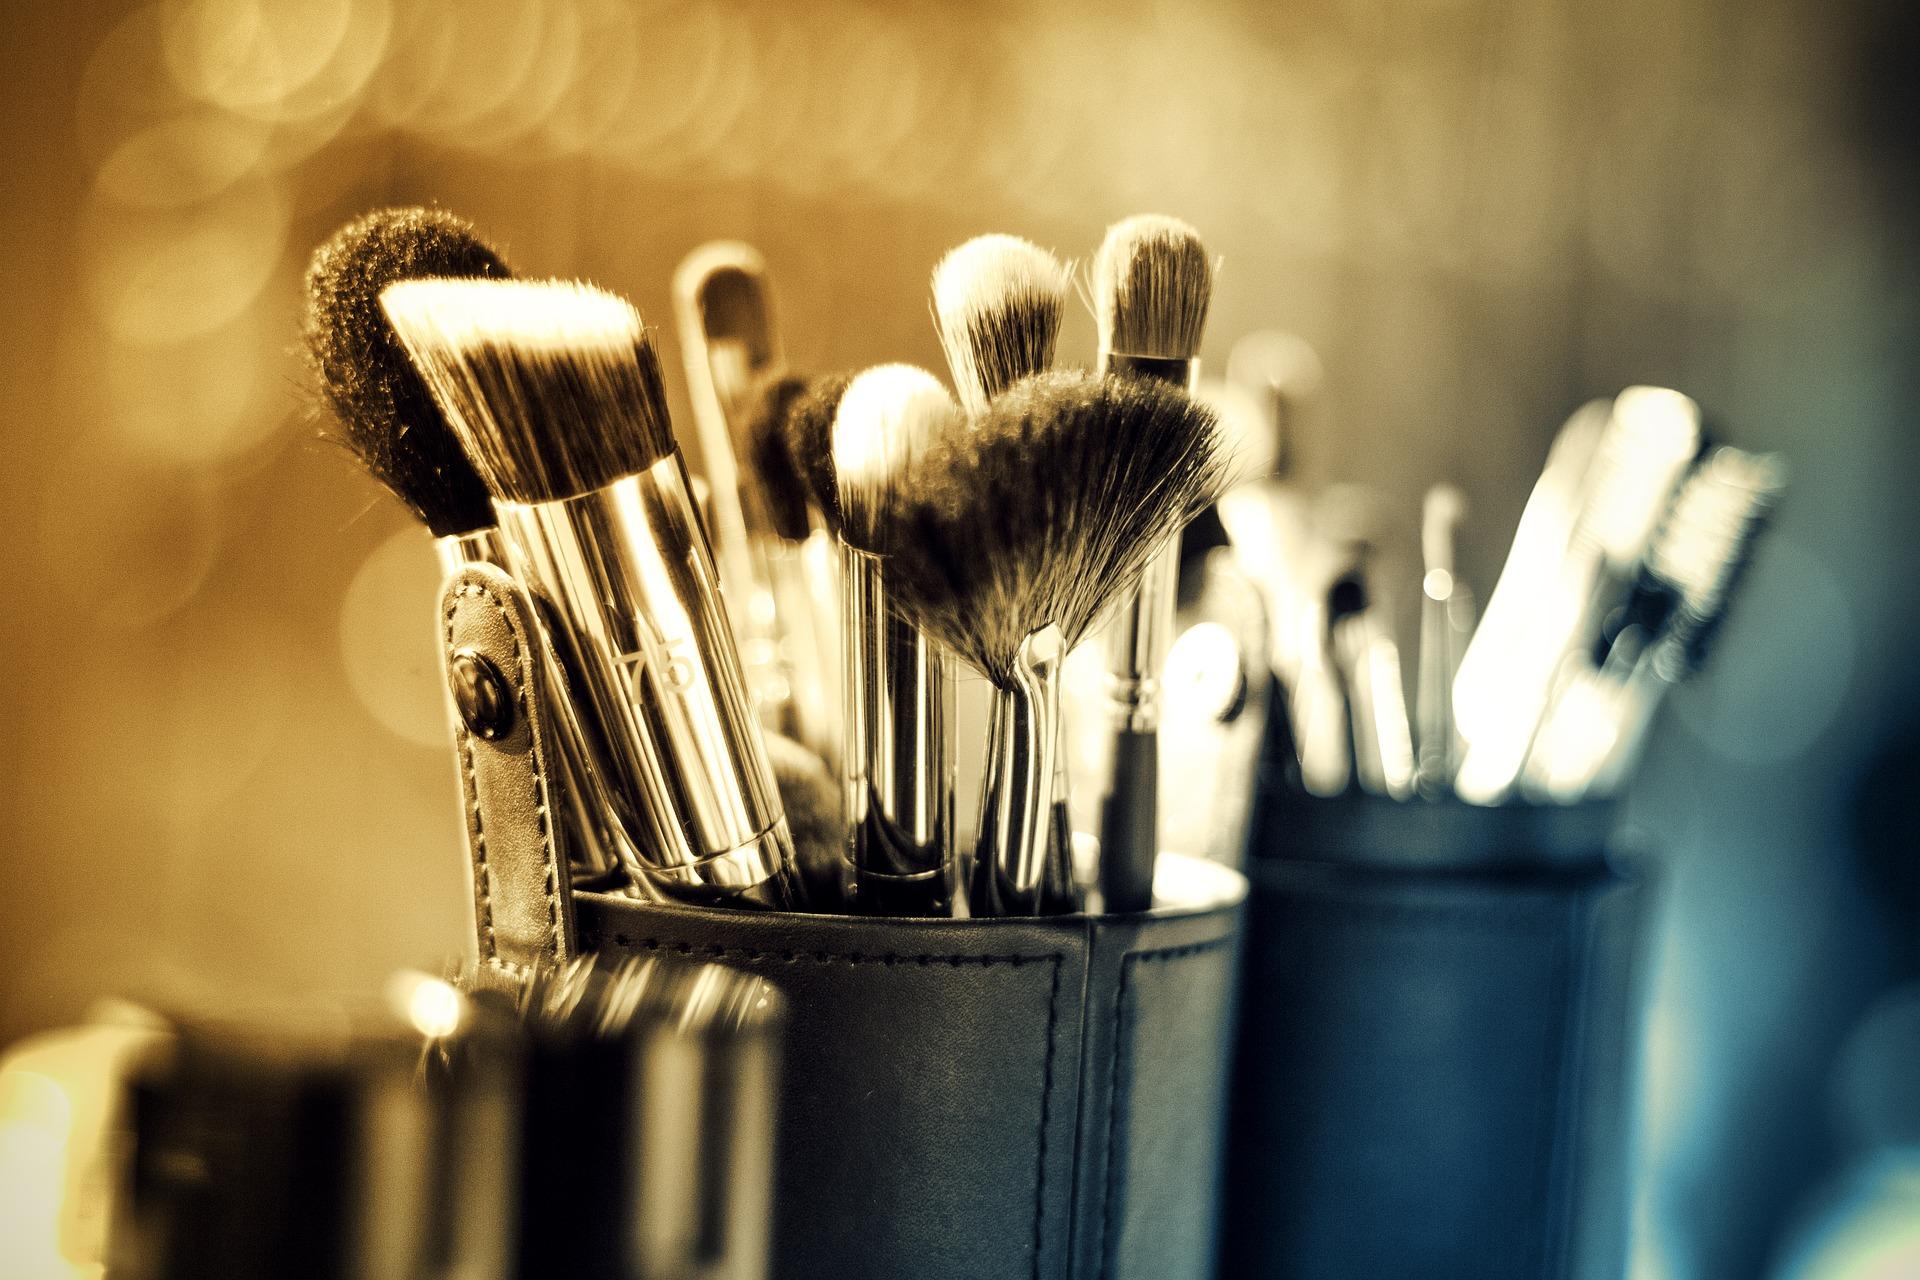 Haarscharf_Hairstylist_Friseur_Fehmarn_makeup-1289325_1920.jpg